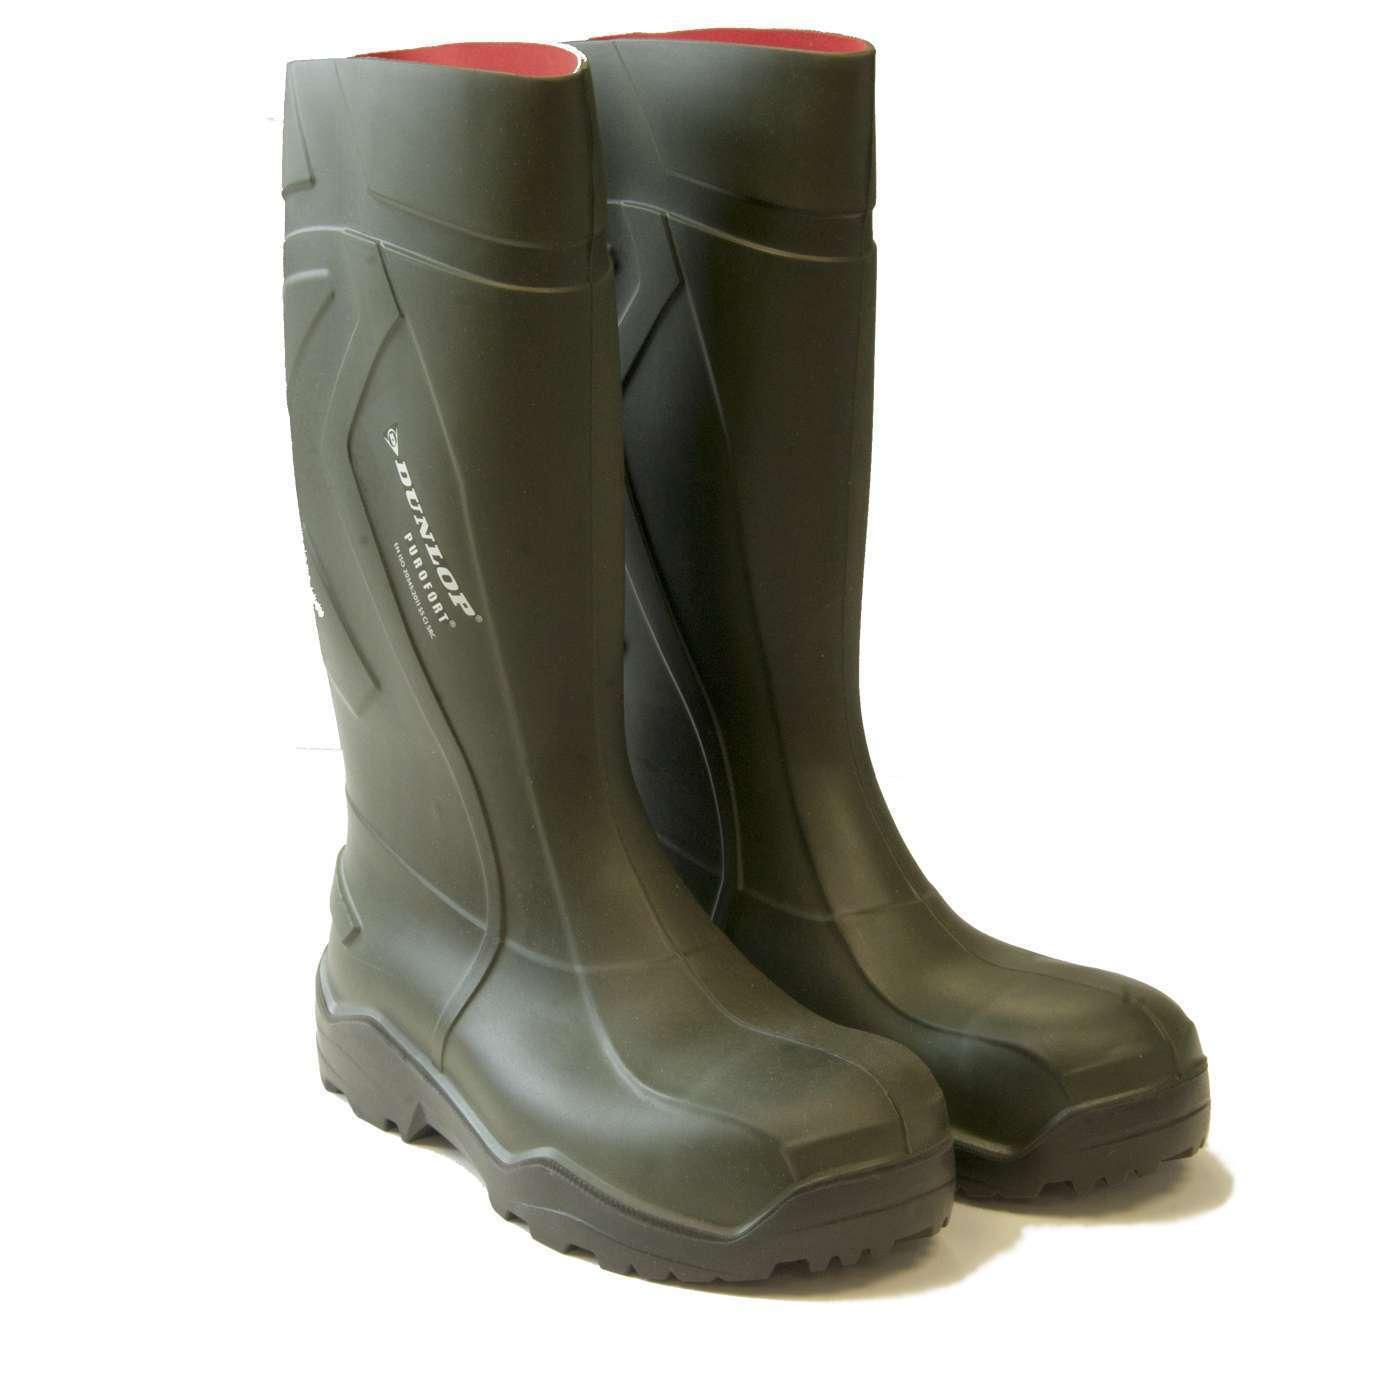 Dunlop Purofort + Safety- Steel toe capped wellingtons